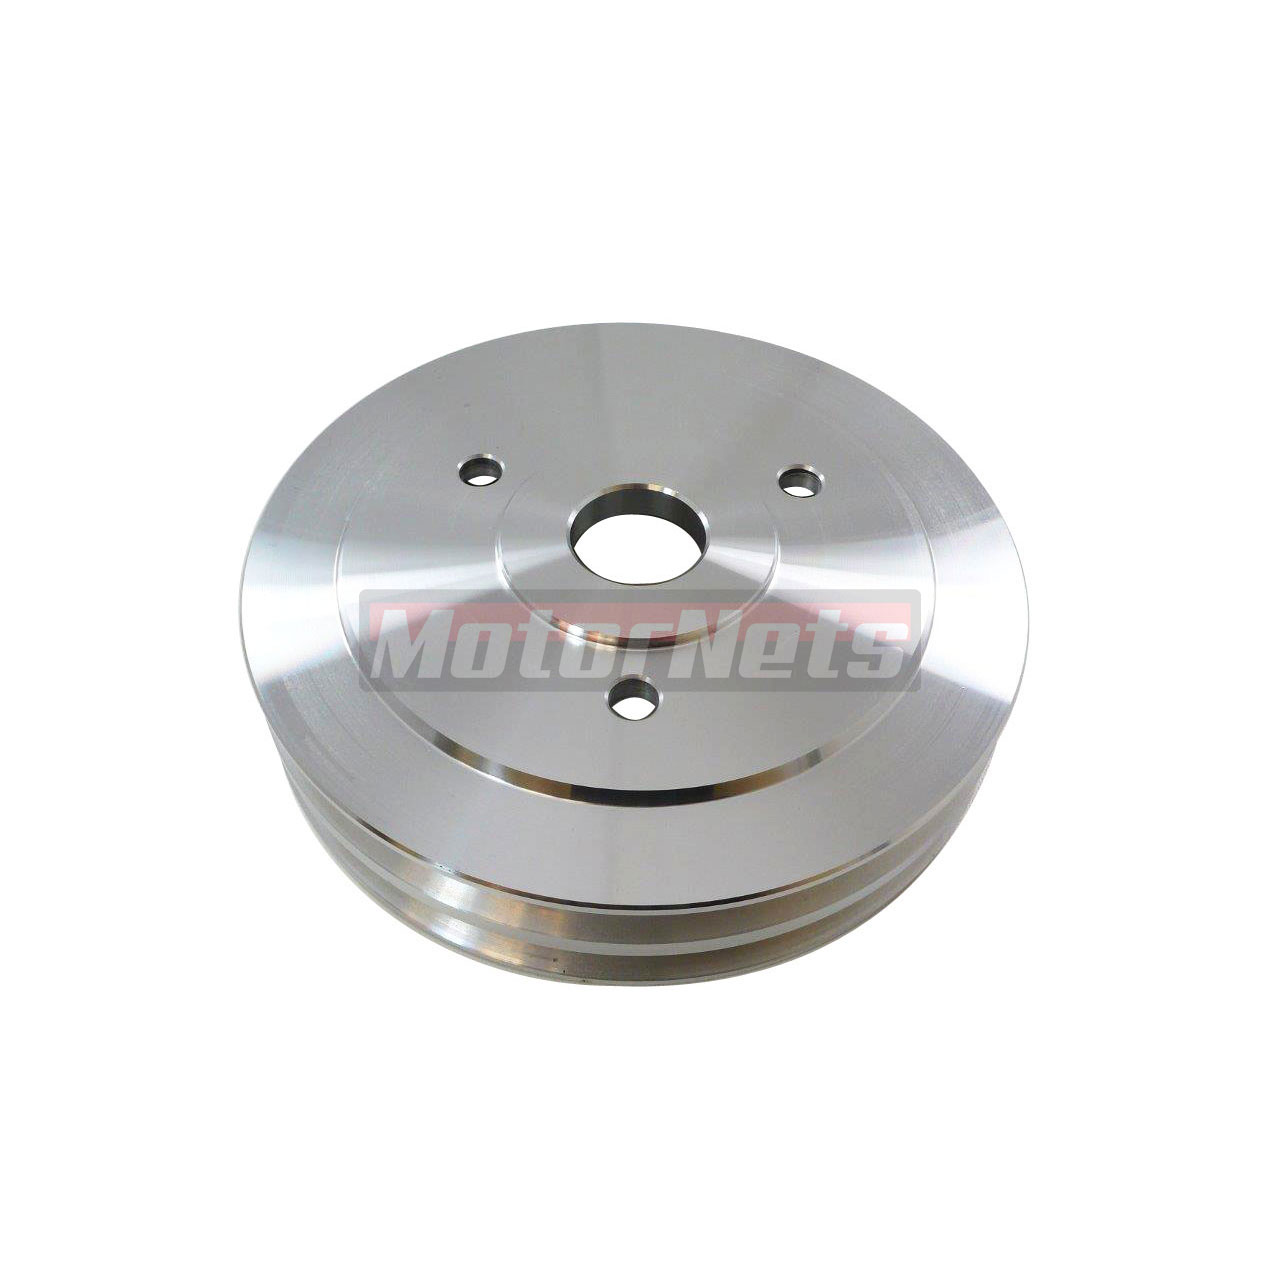 Satin Aluminum BBC Chevy 396-454 Crankshaft Pulley 2